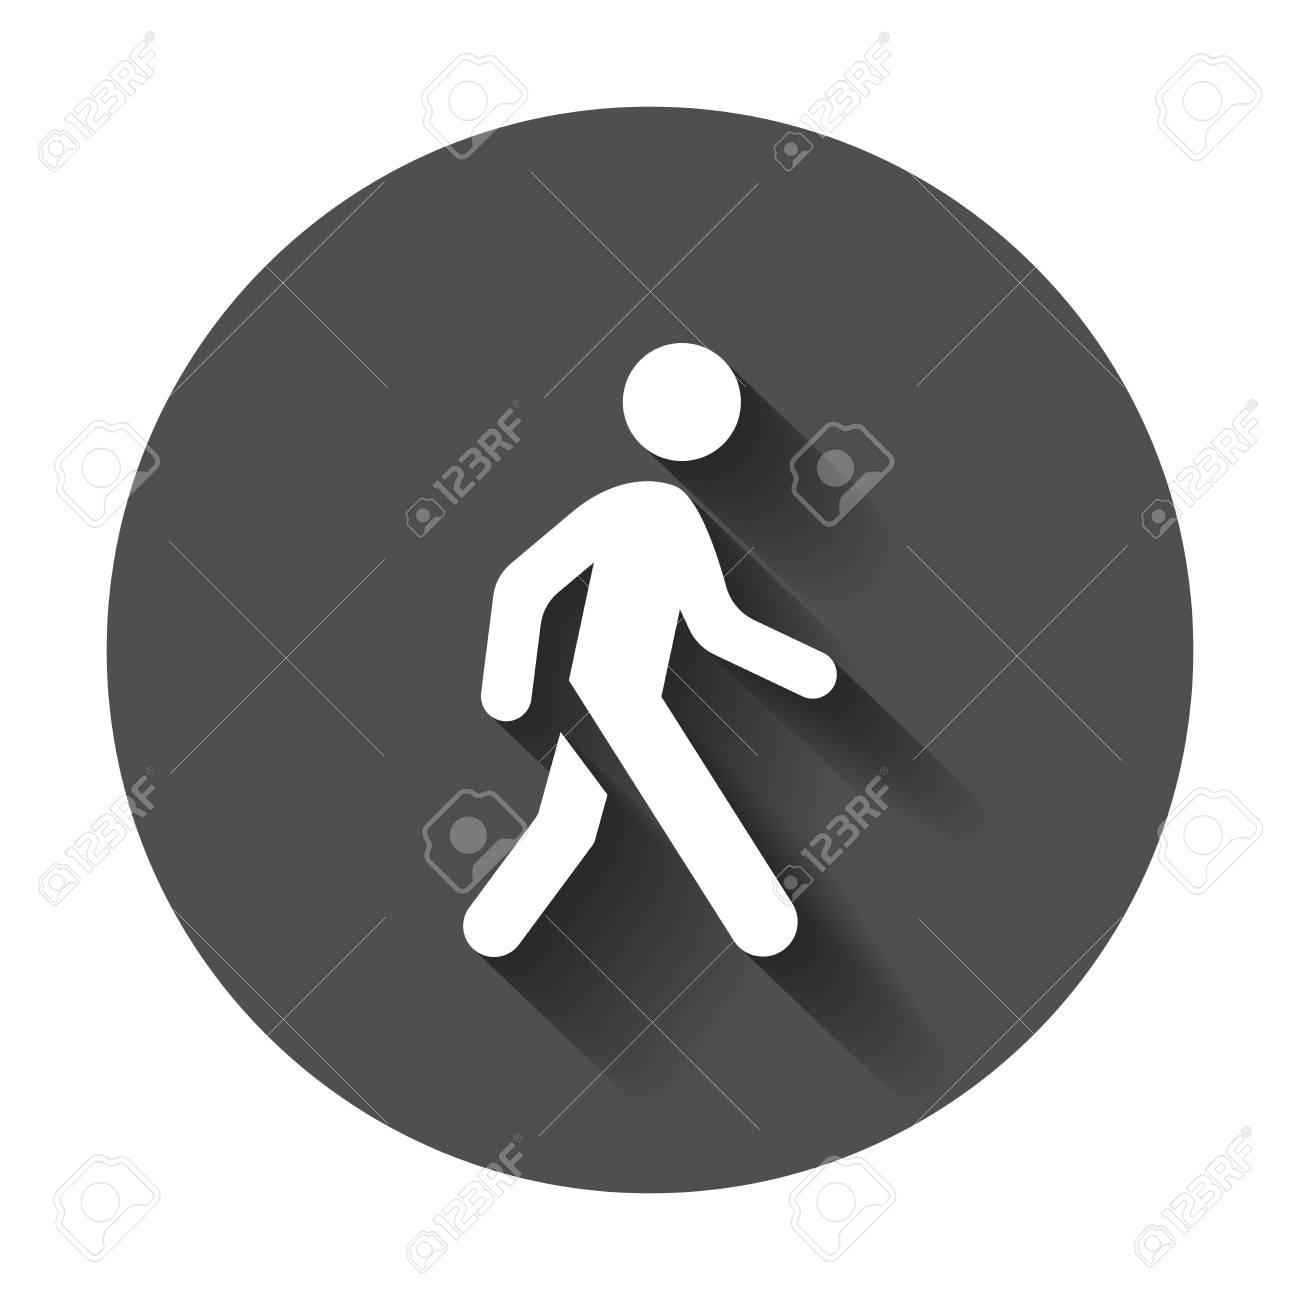 walking man vector icon people walk sign illustration on black royalty free cliparts vectors and stock illustration image 82678487 walking man vector icon people walk sign illustration on black